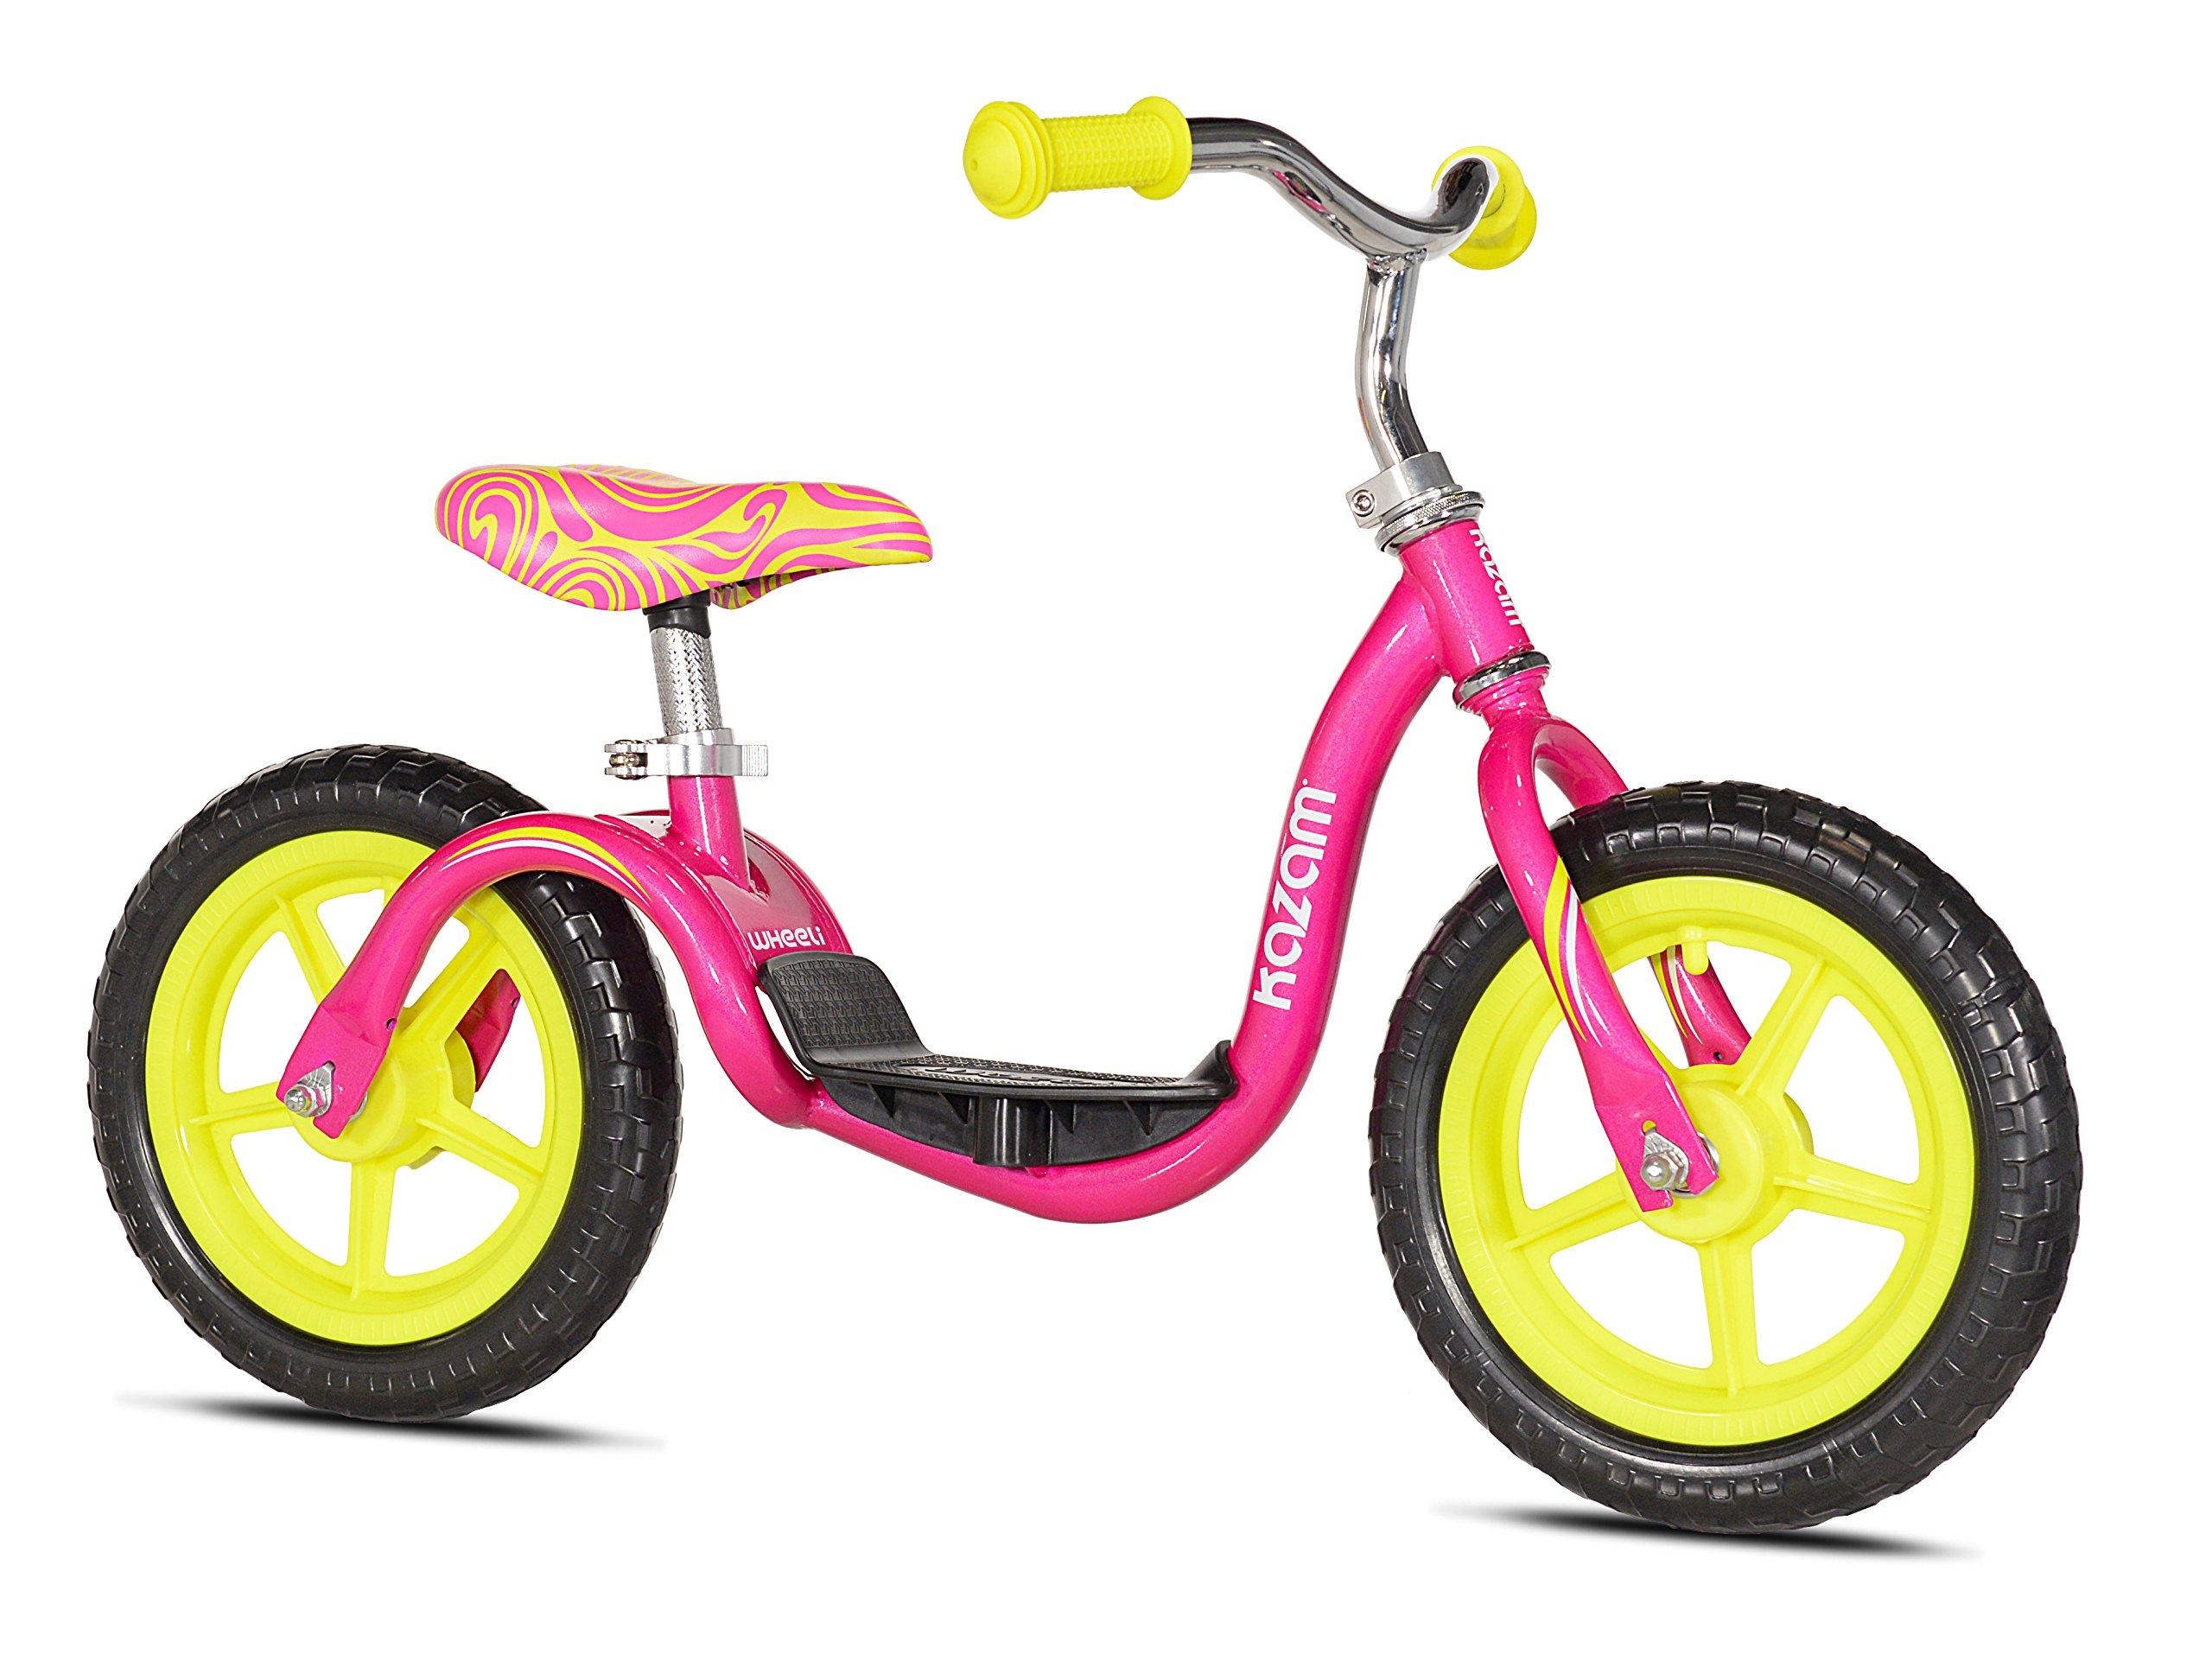 KaZAM v2e No Pedal Balance Bike, Pink/Yellow